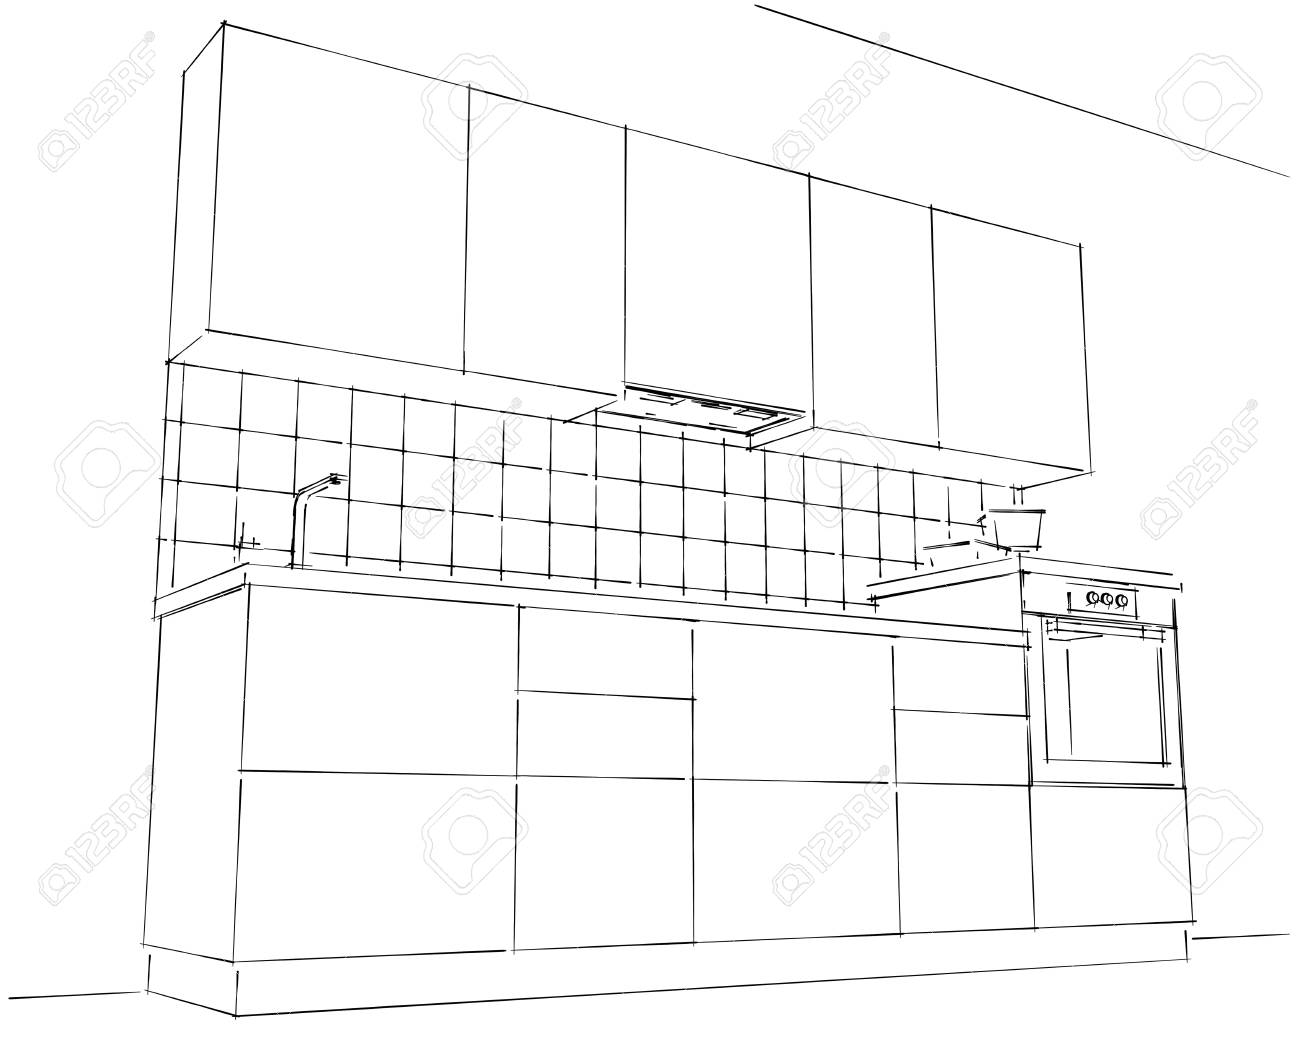 Dibujo Cocina Free El Dibujo Animado Delantal De Cocina With Dibujo